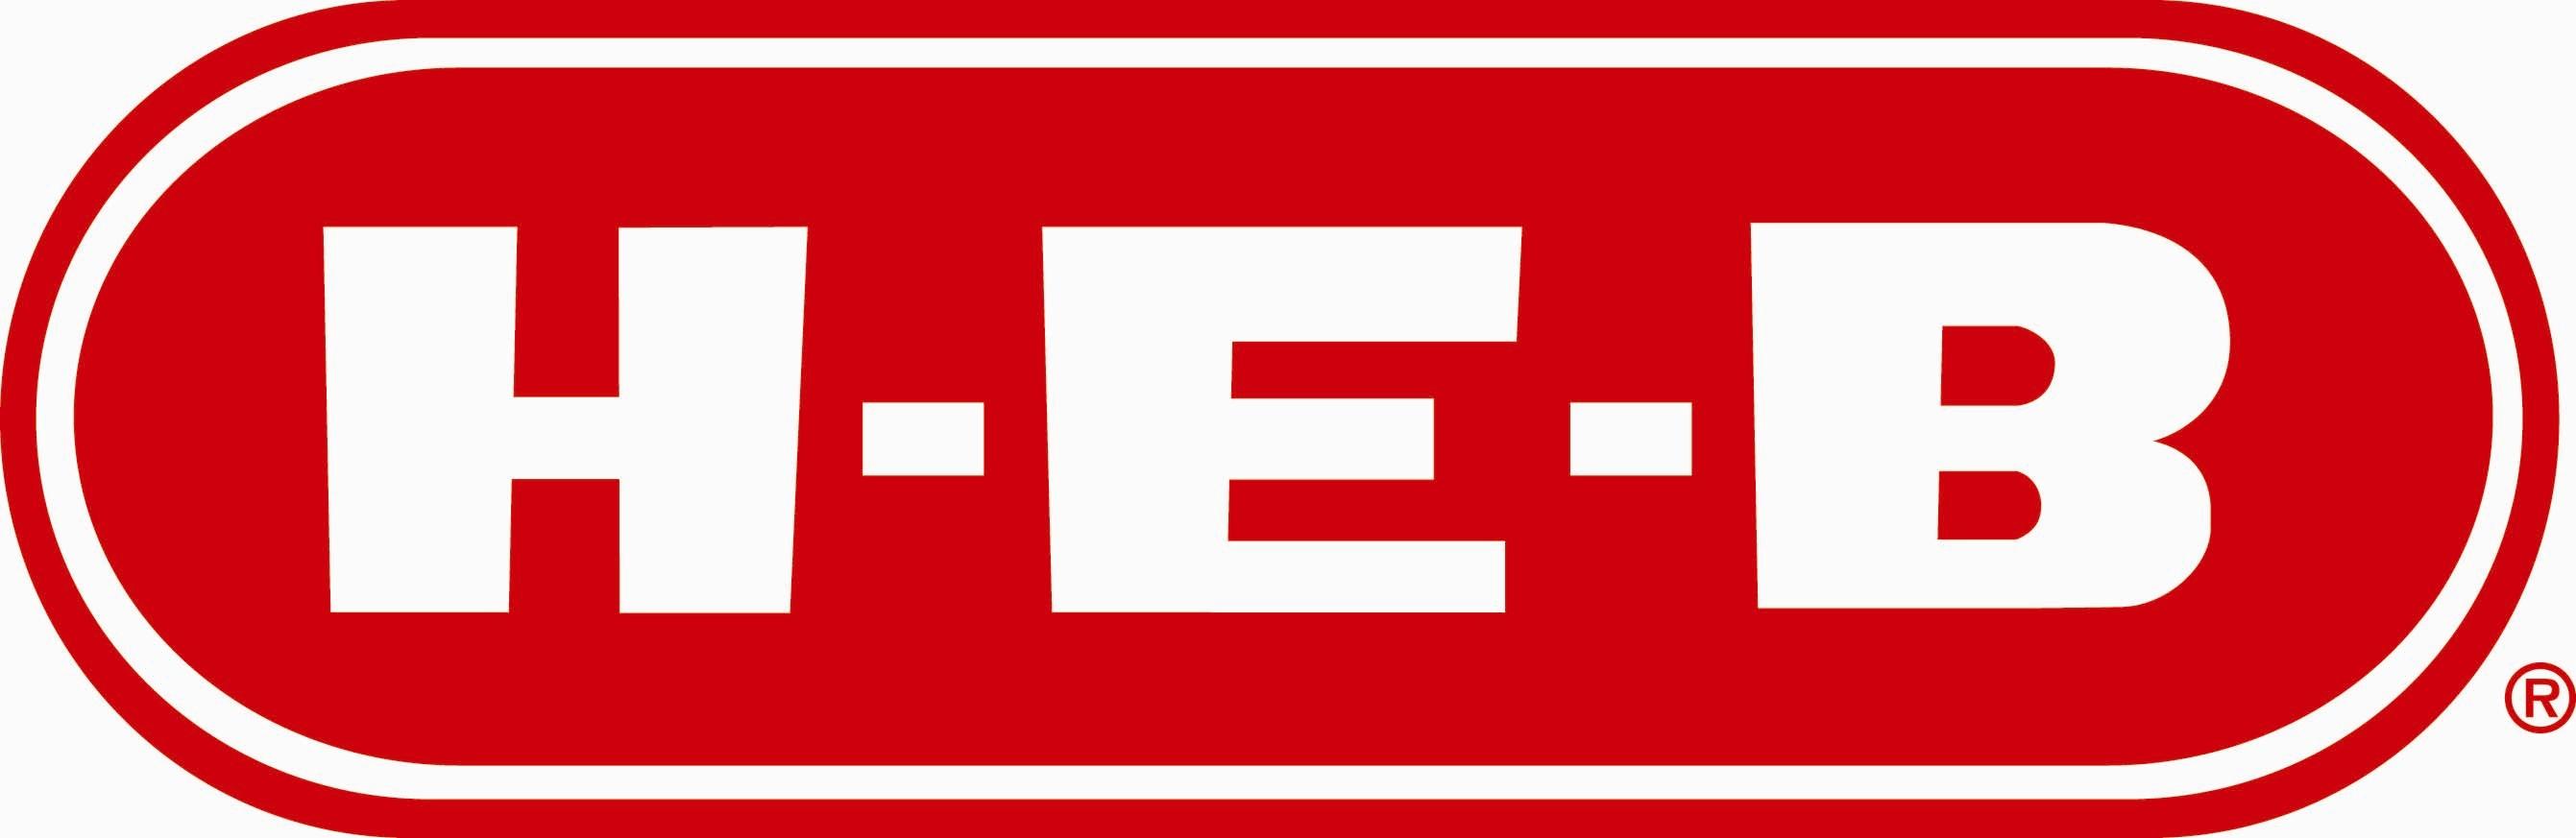 https://growthzonesitesprod.azureedge.net/wp-content/uploads/sites/787/2021/04/HEB-logo-2013.jpg